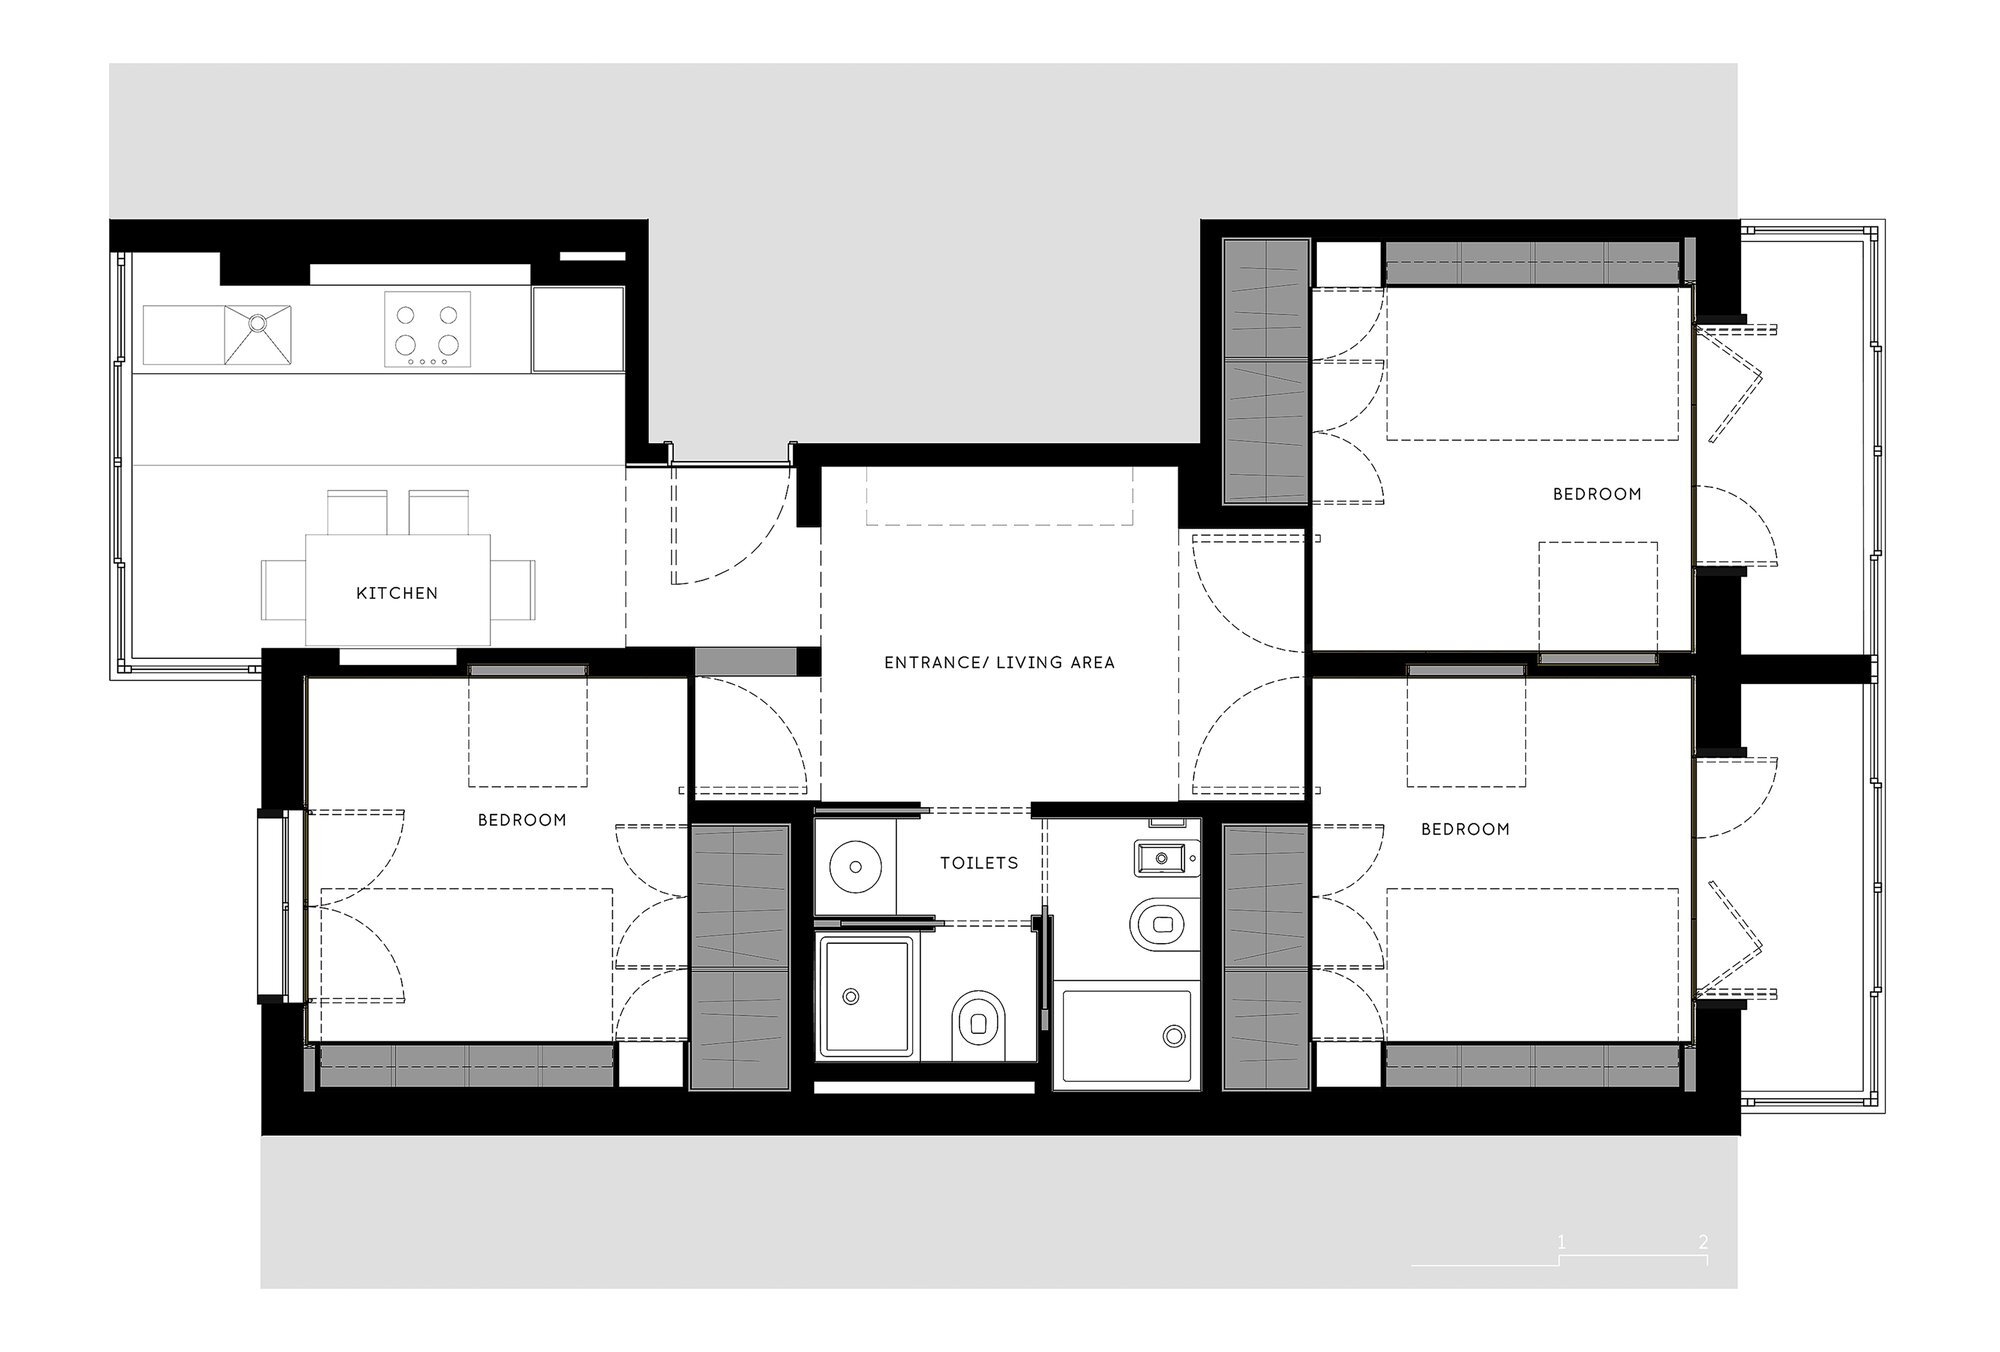 Xadrez Apartment - Small Apartment - UMA Collective - Portugal -  Floor Plan - Humble Homes